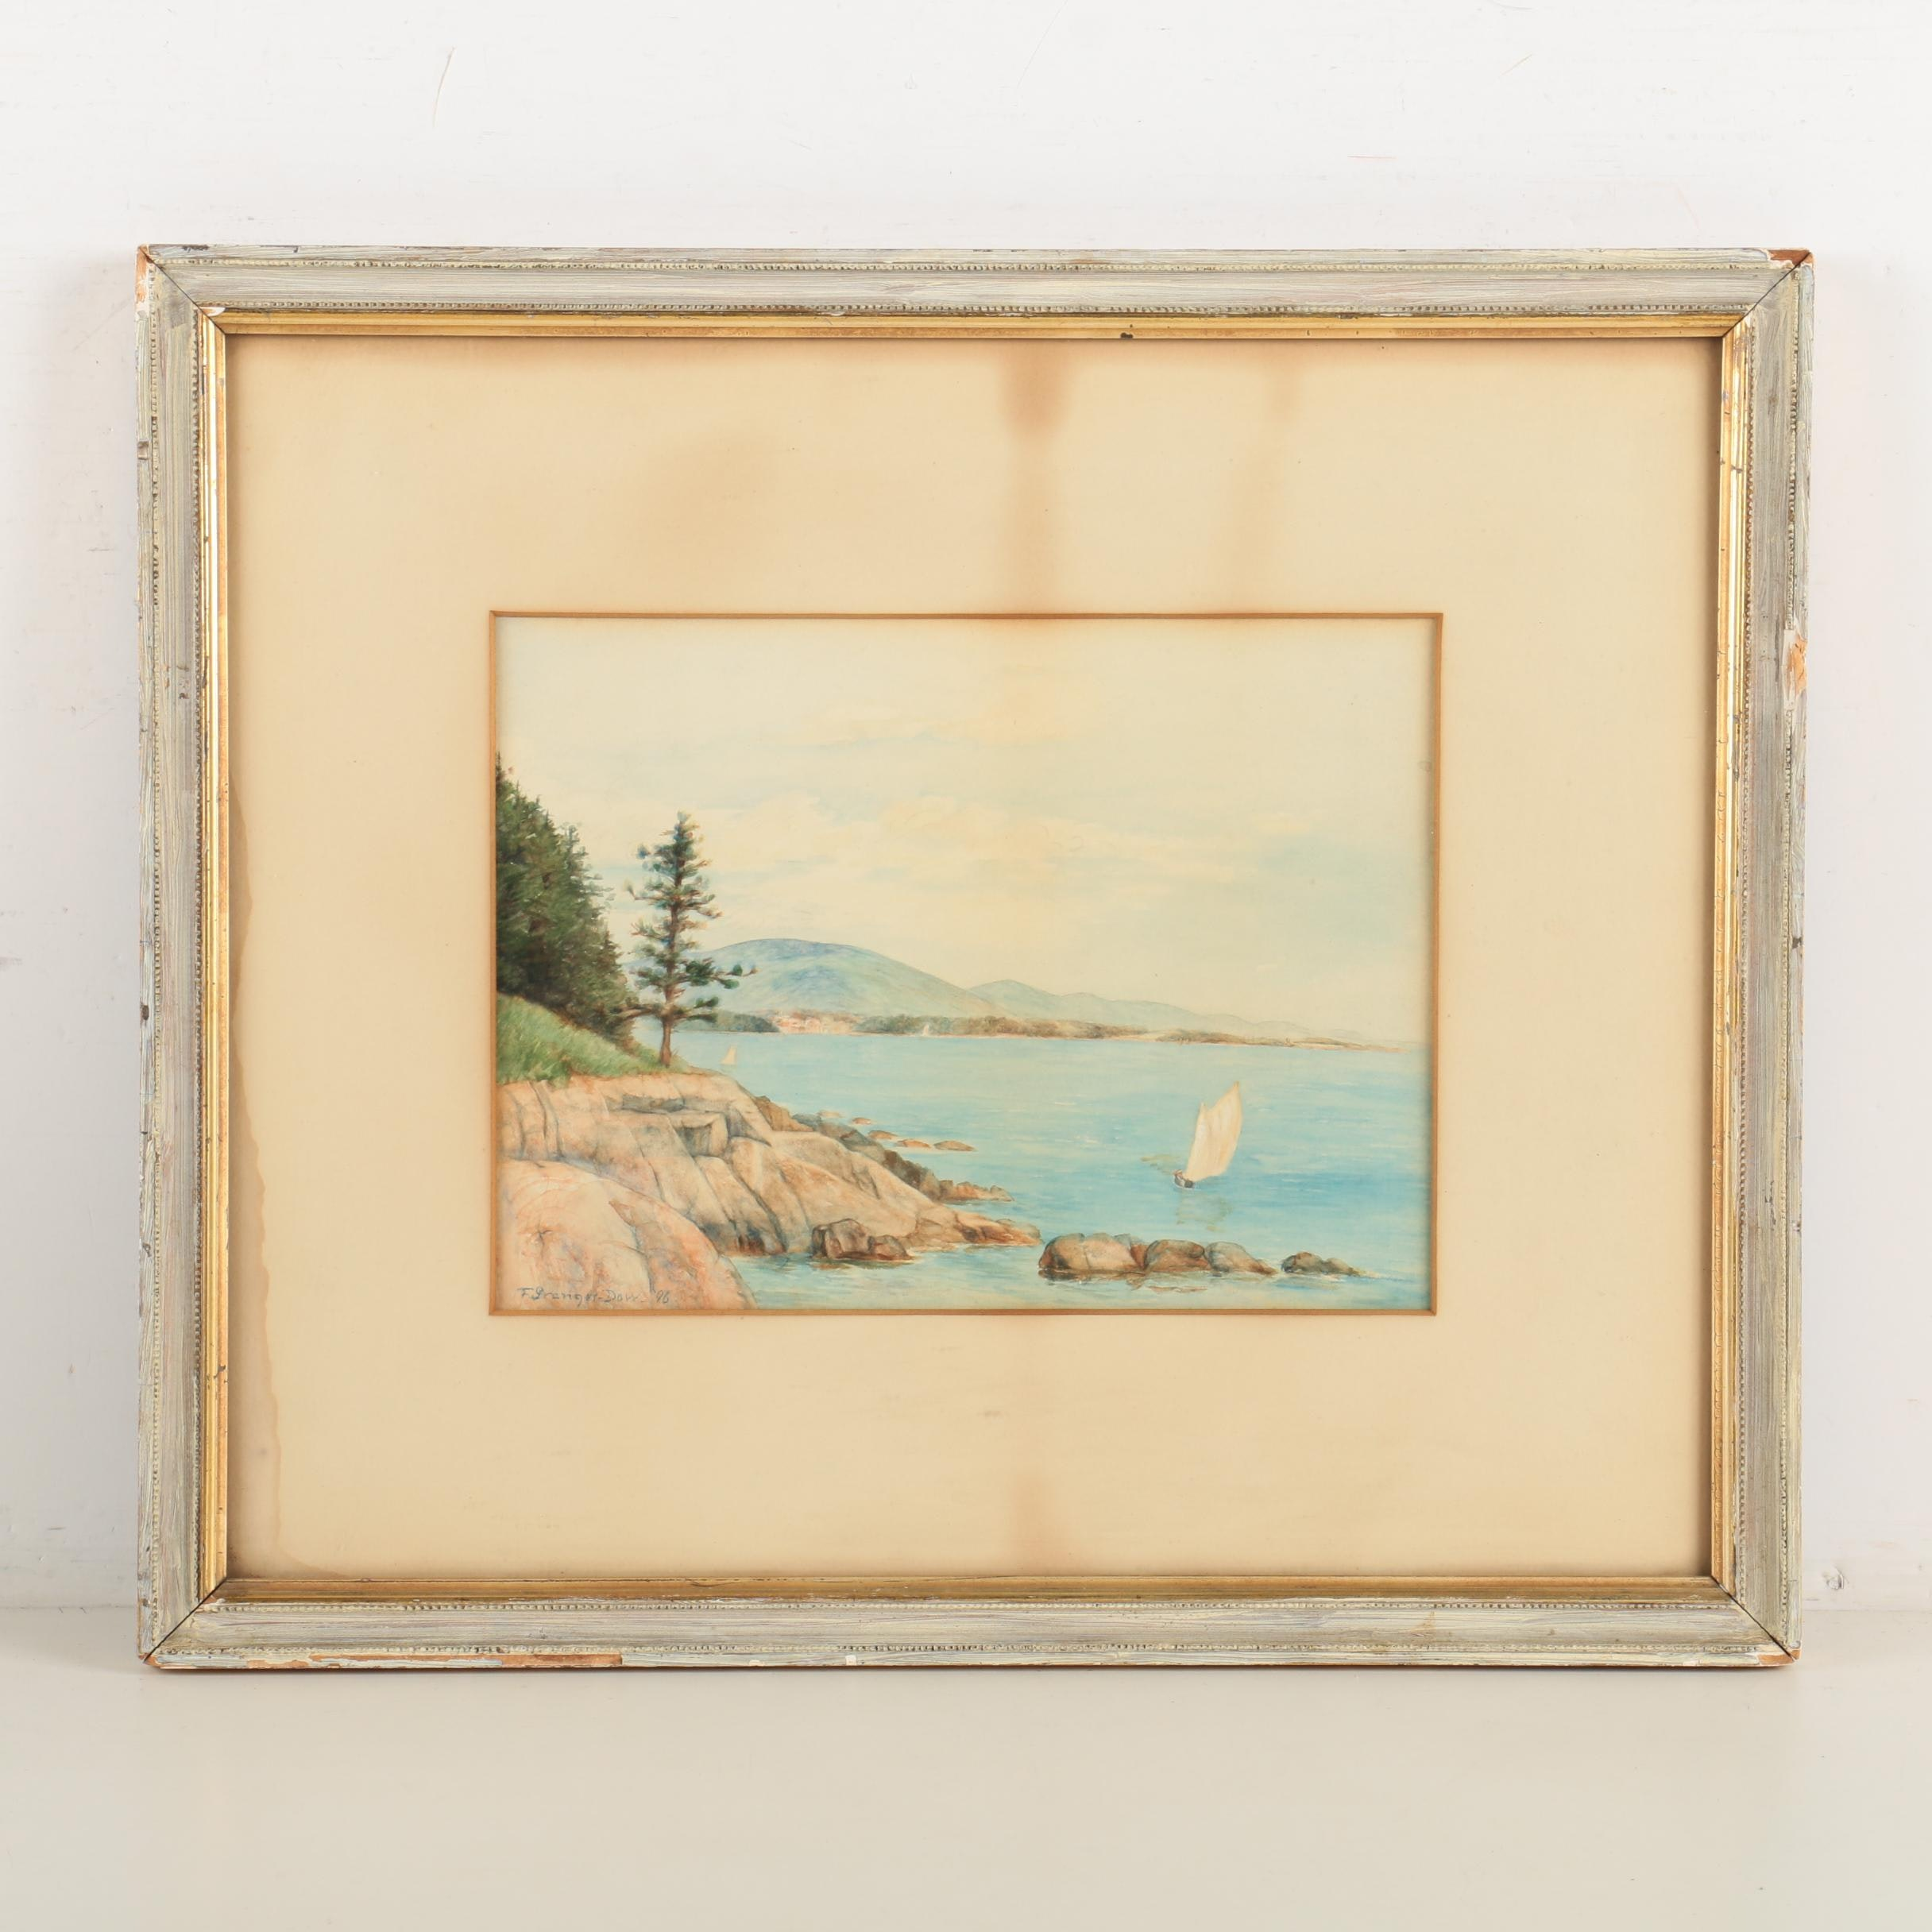 F. Granger Dow Watercolor Painting of Coastal Scene